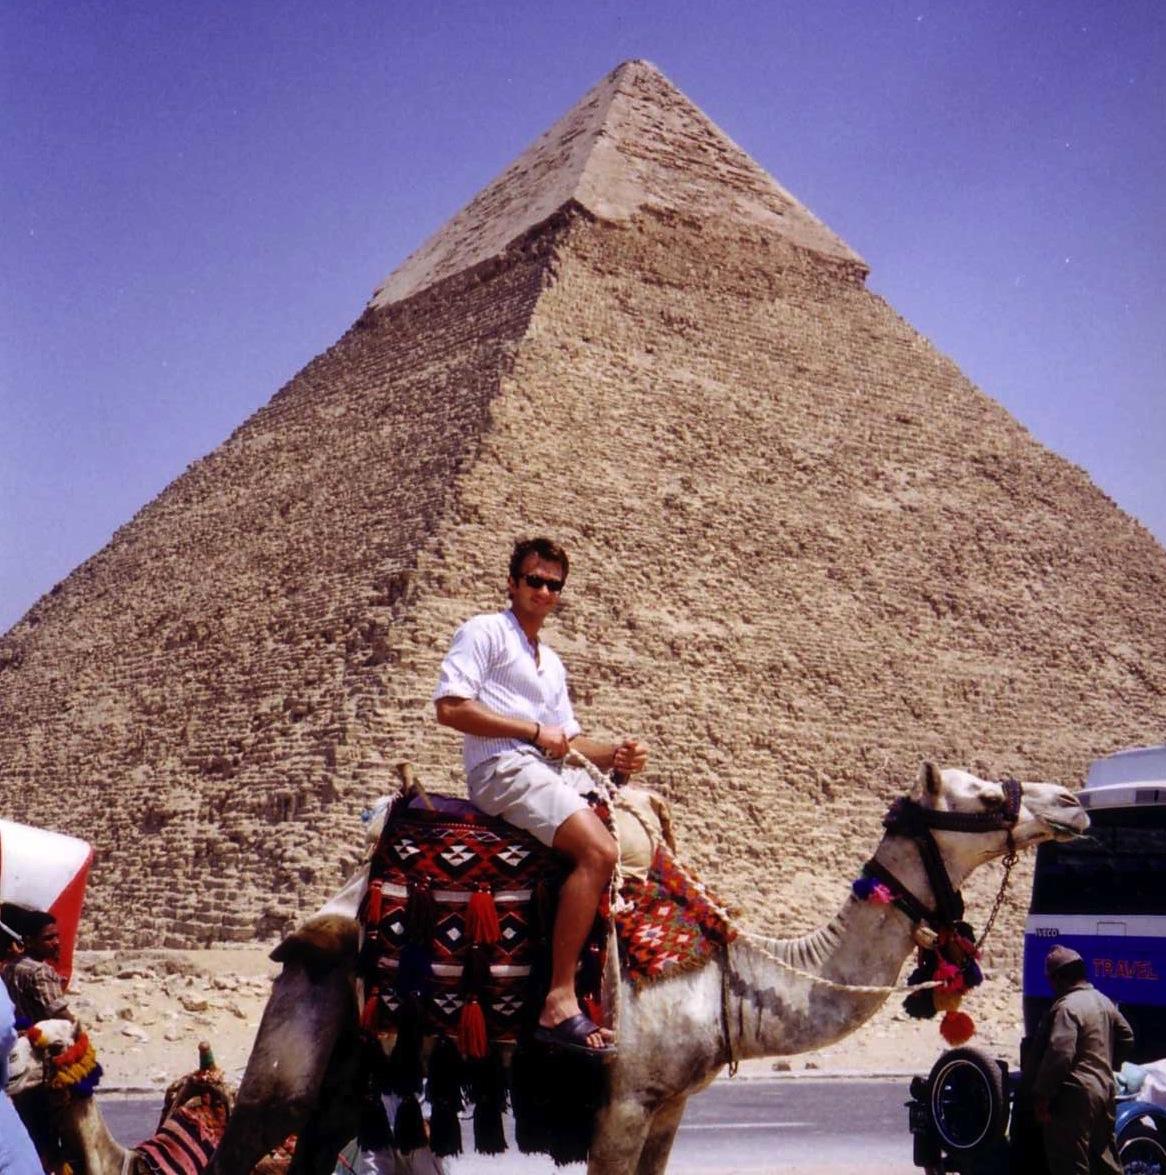 TE on a camel 28-7 pyramids sq